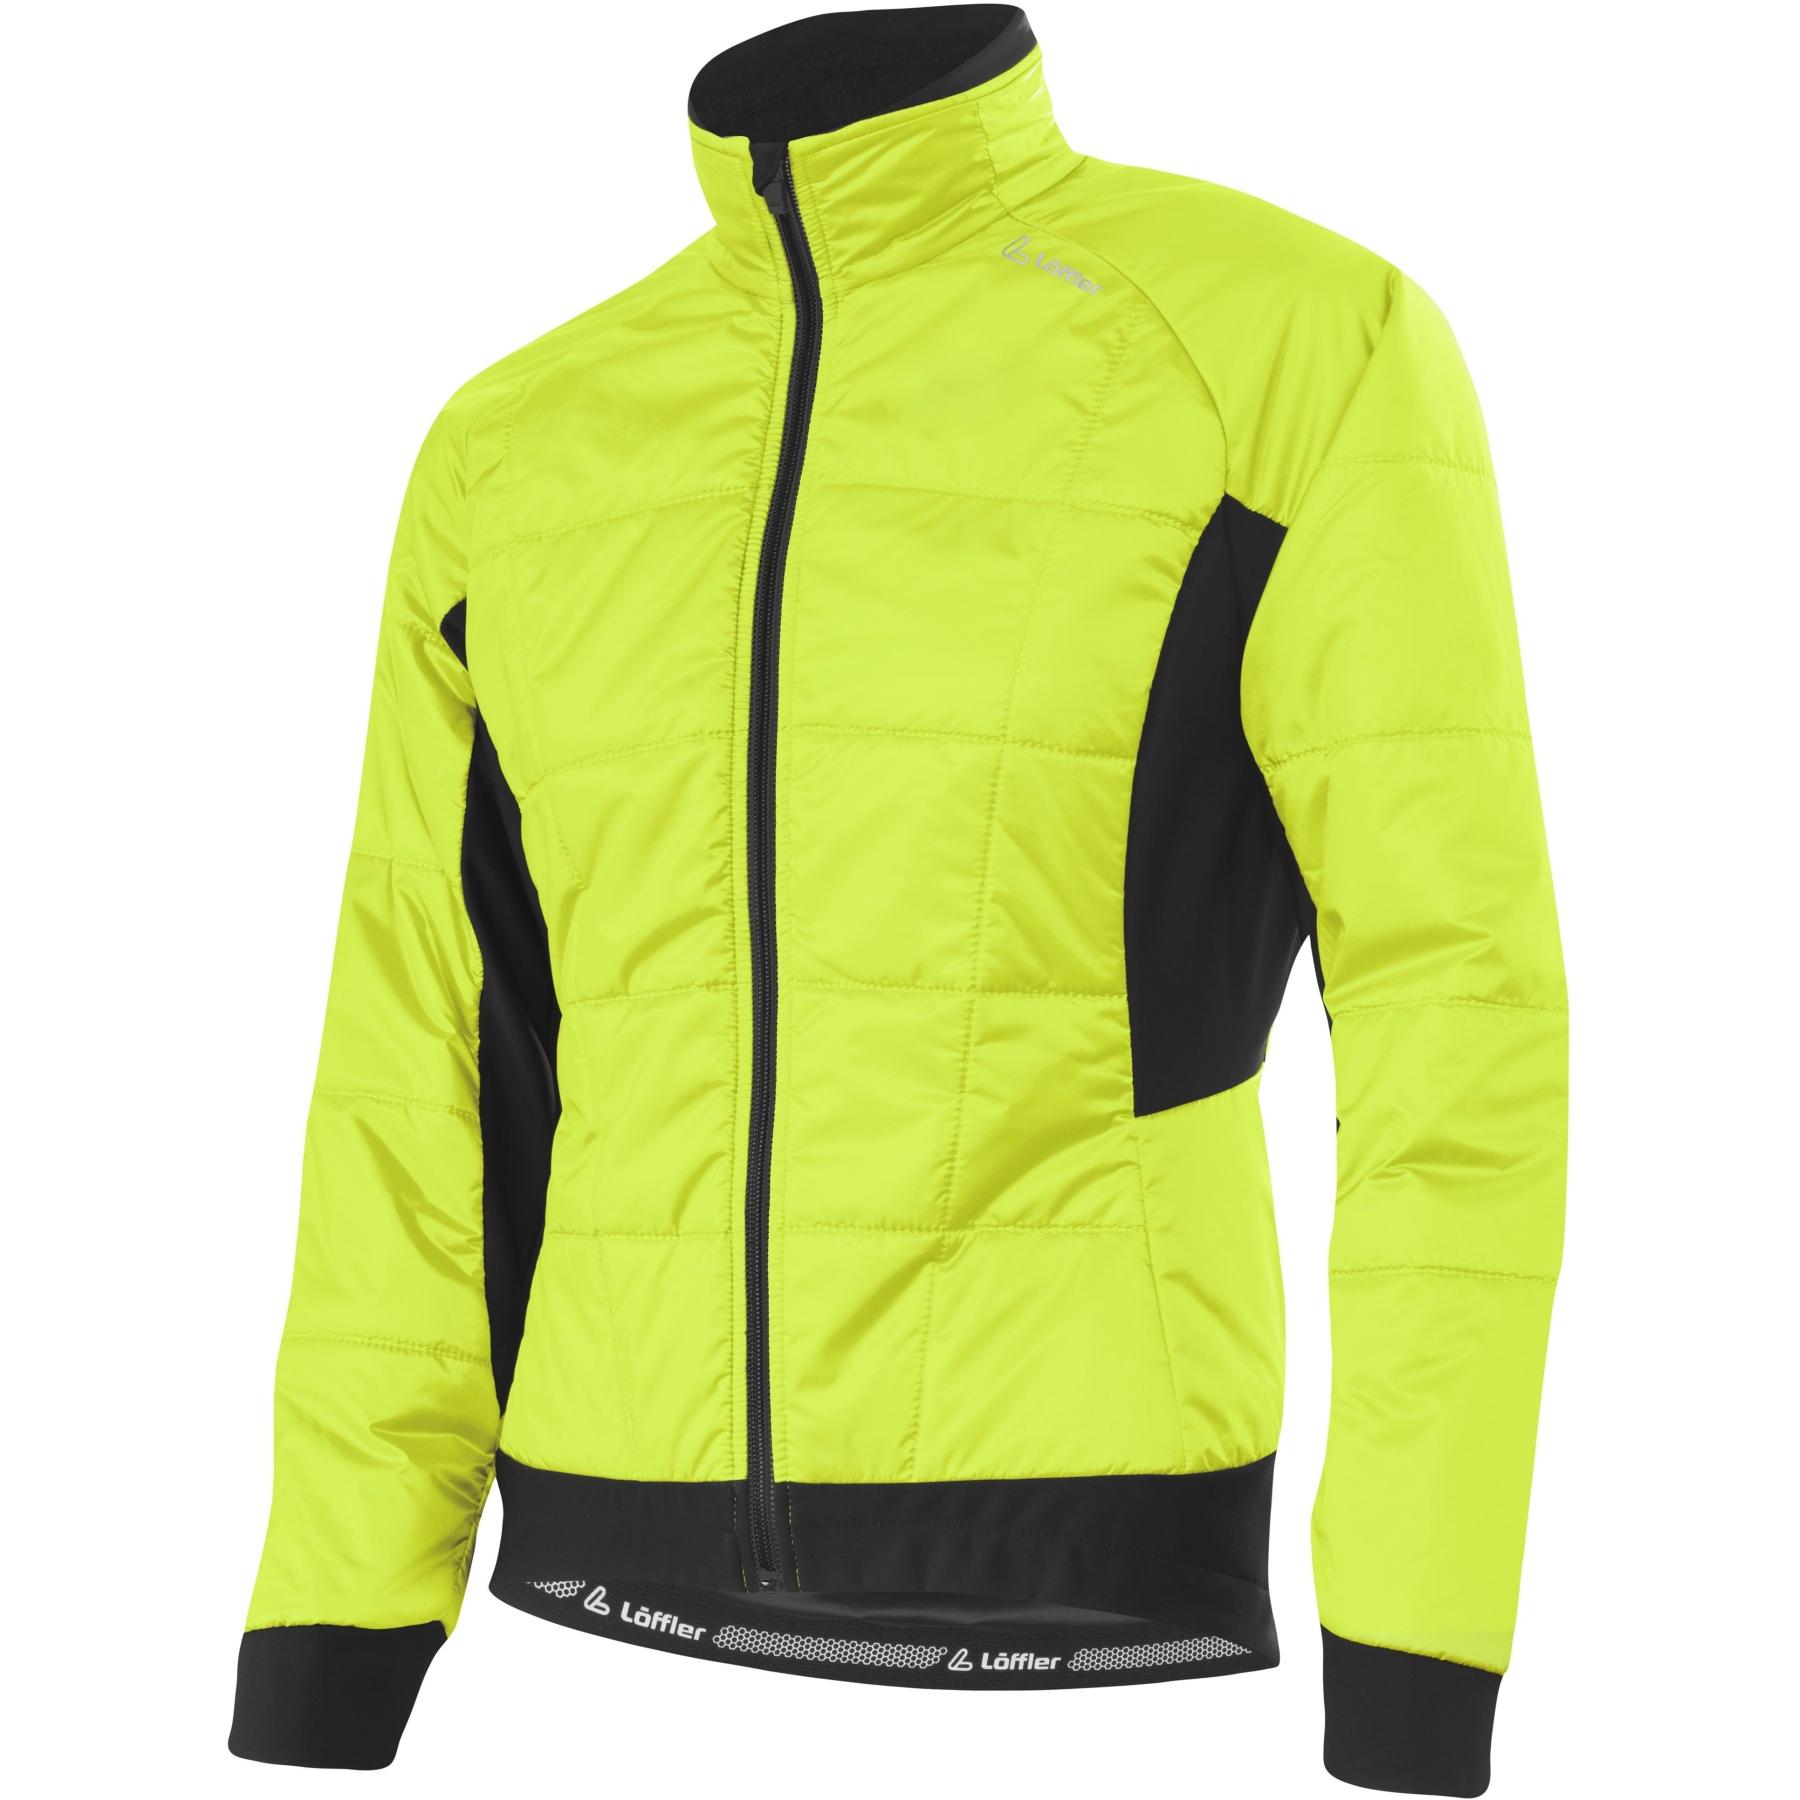 Löffler Bike Iso Jacke Hotbond® PL60 Damen 20603 - neon gelb 200